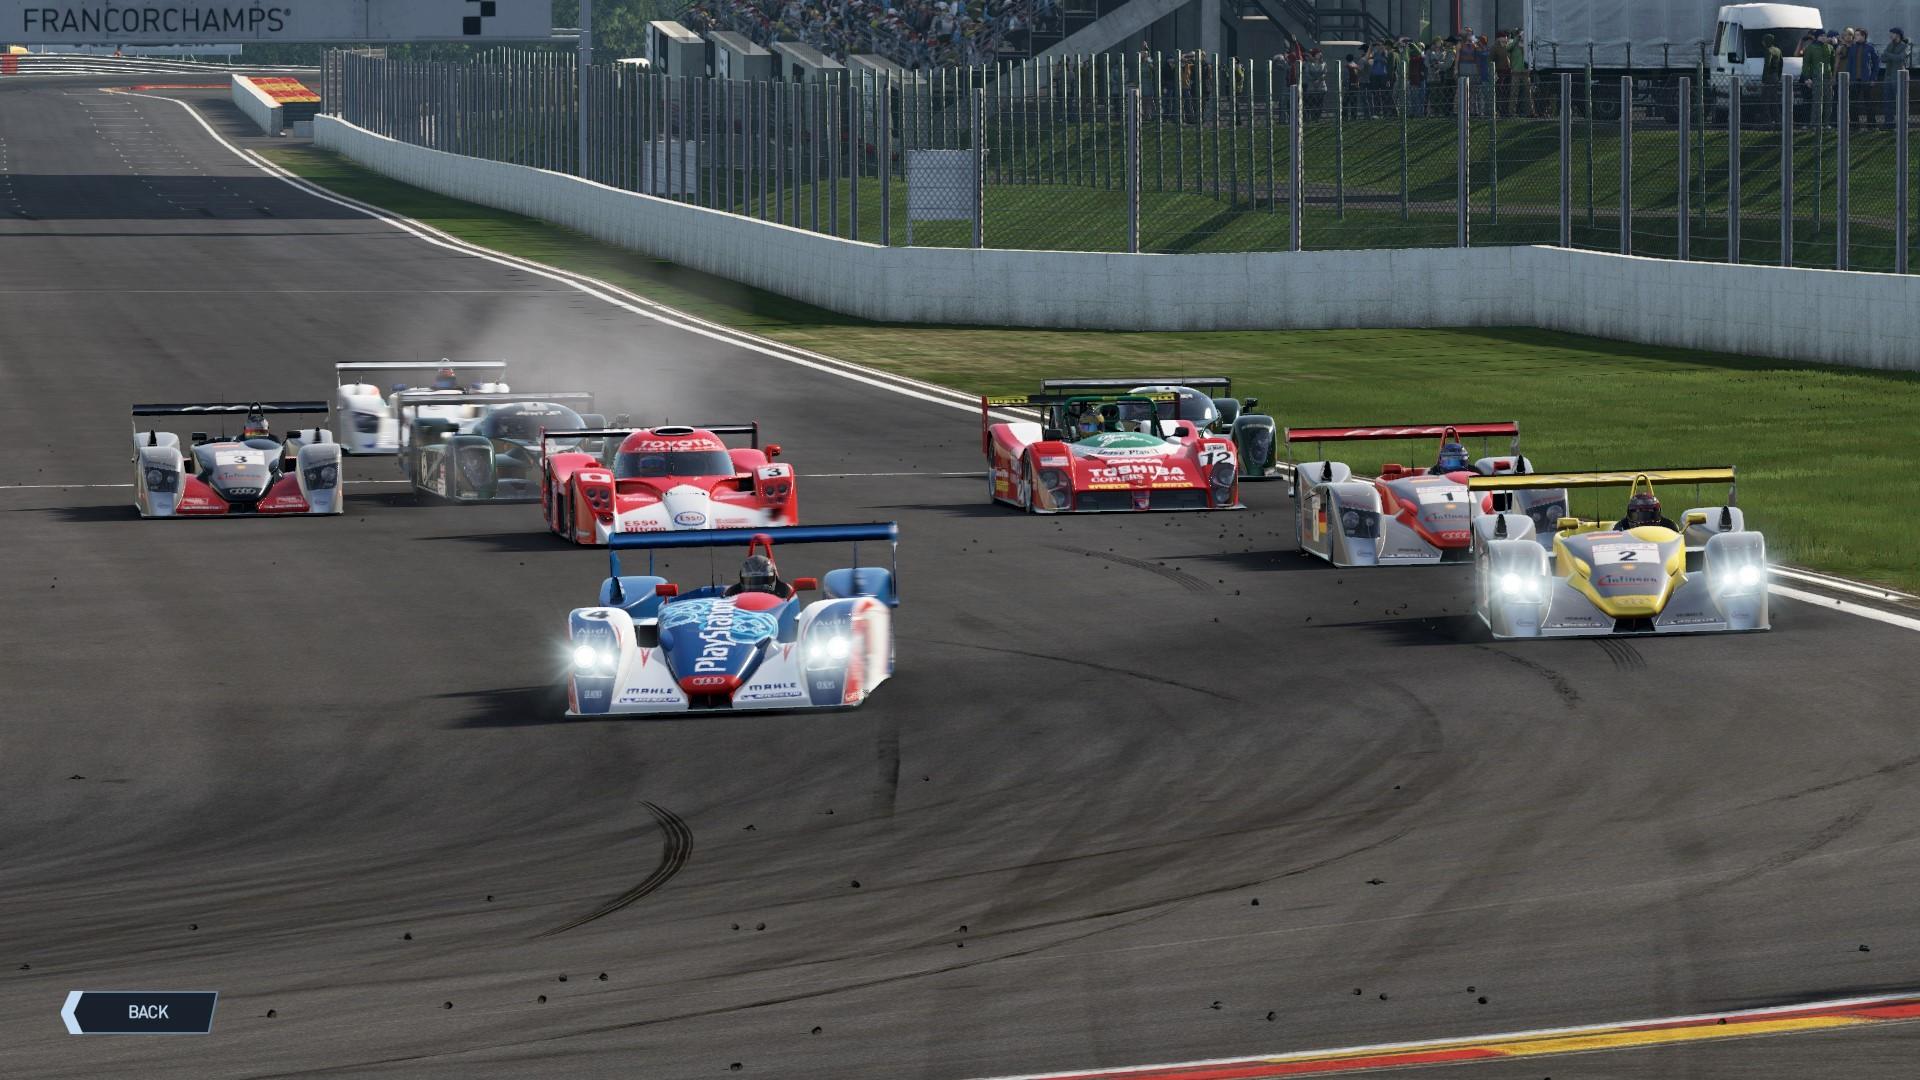 Project Cars 2 – LMP900 Bajnokság